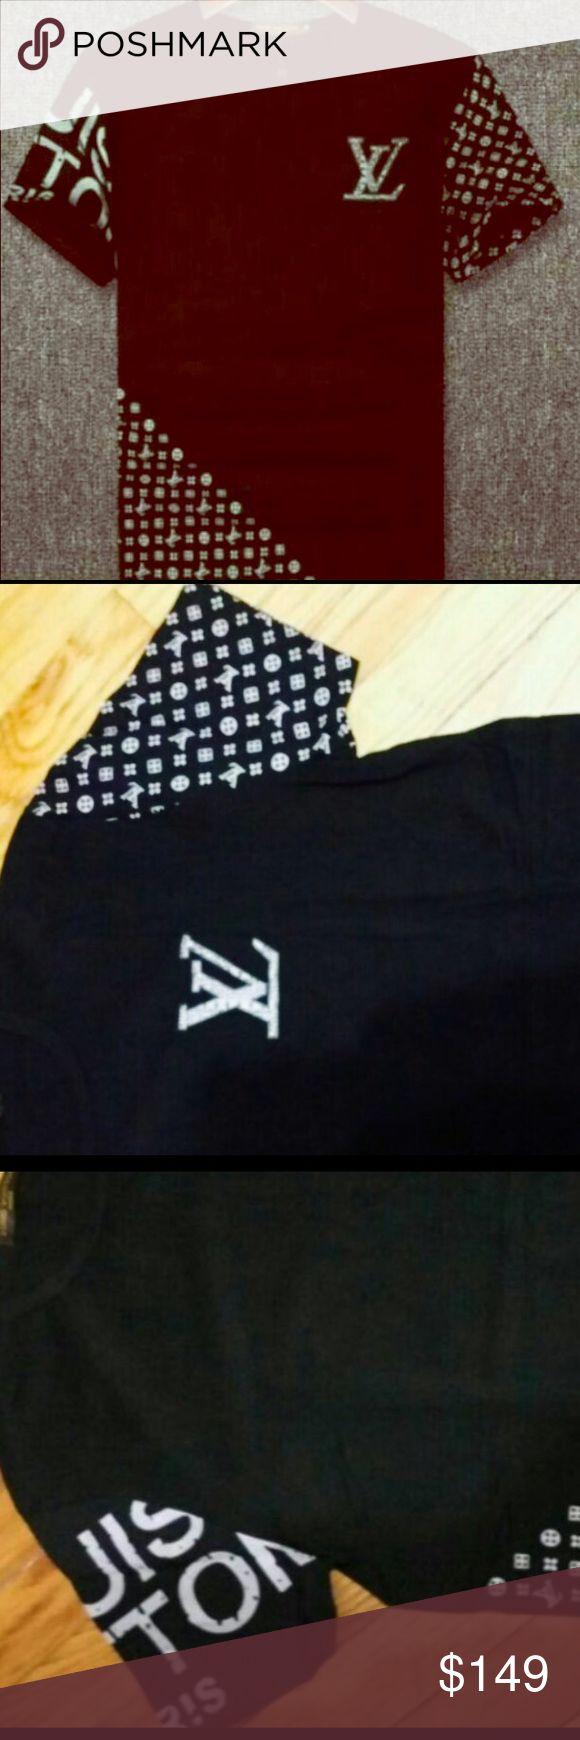 Mens Louis Vuitton T-shirt Mens LV Graphic T-Shirt NWT, Dint let it get away guy.. Louis Vuitton Shirts Tees - Short Sleeve